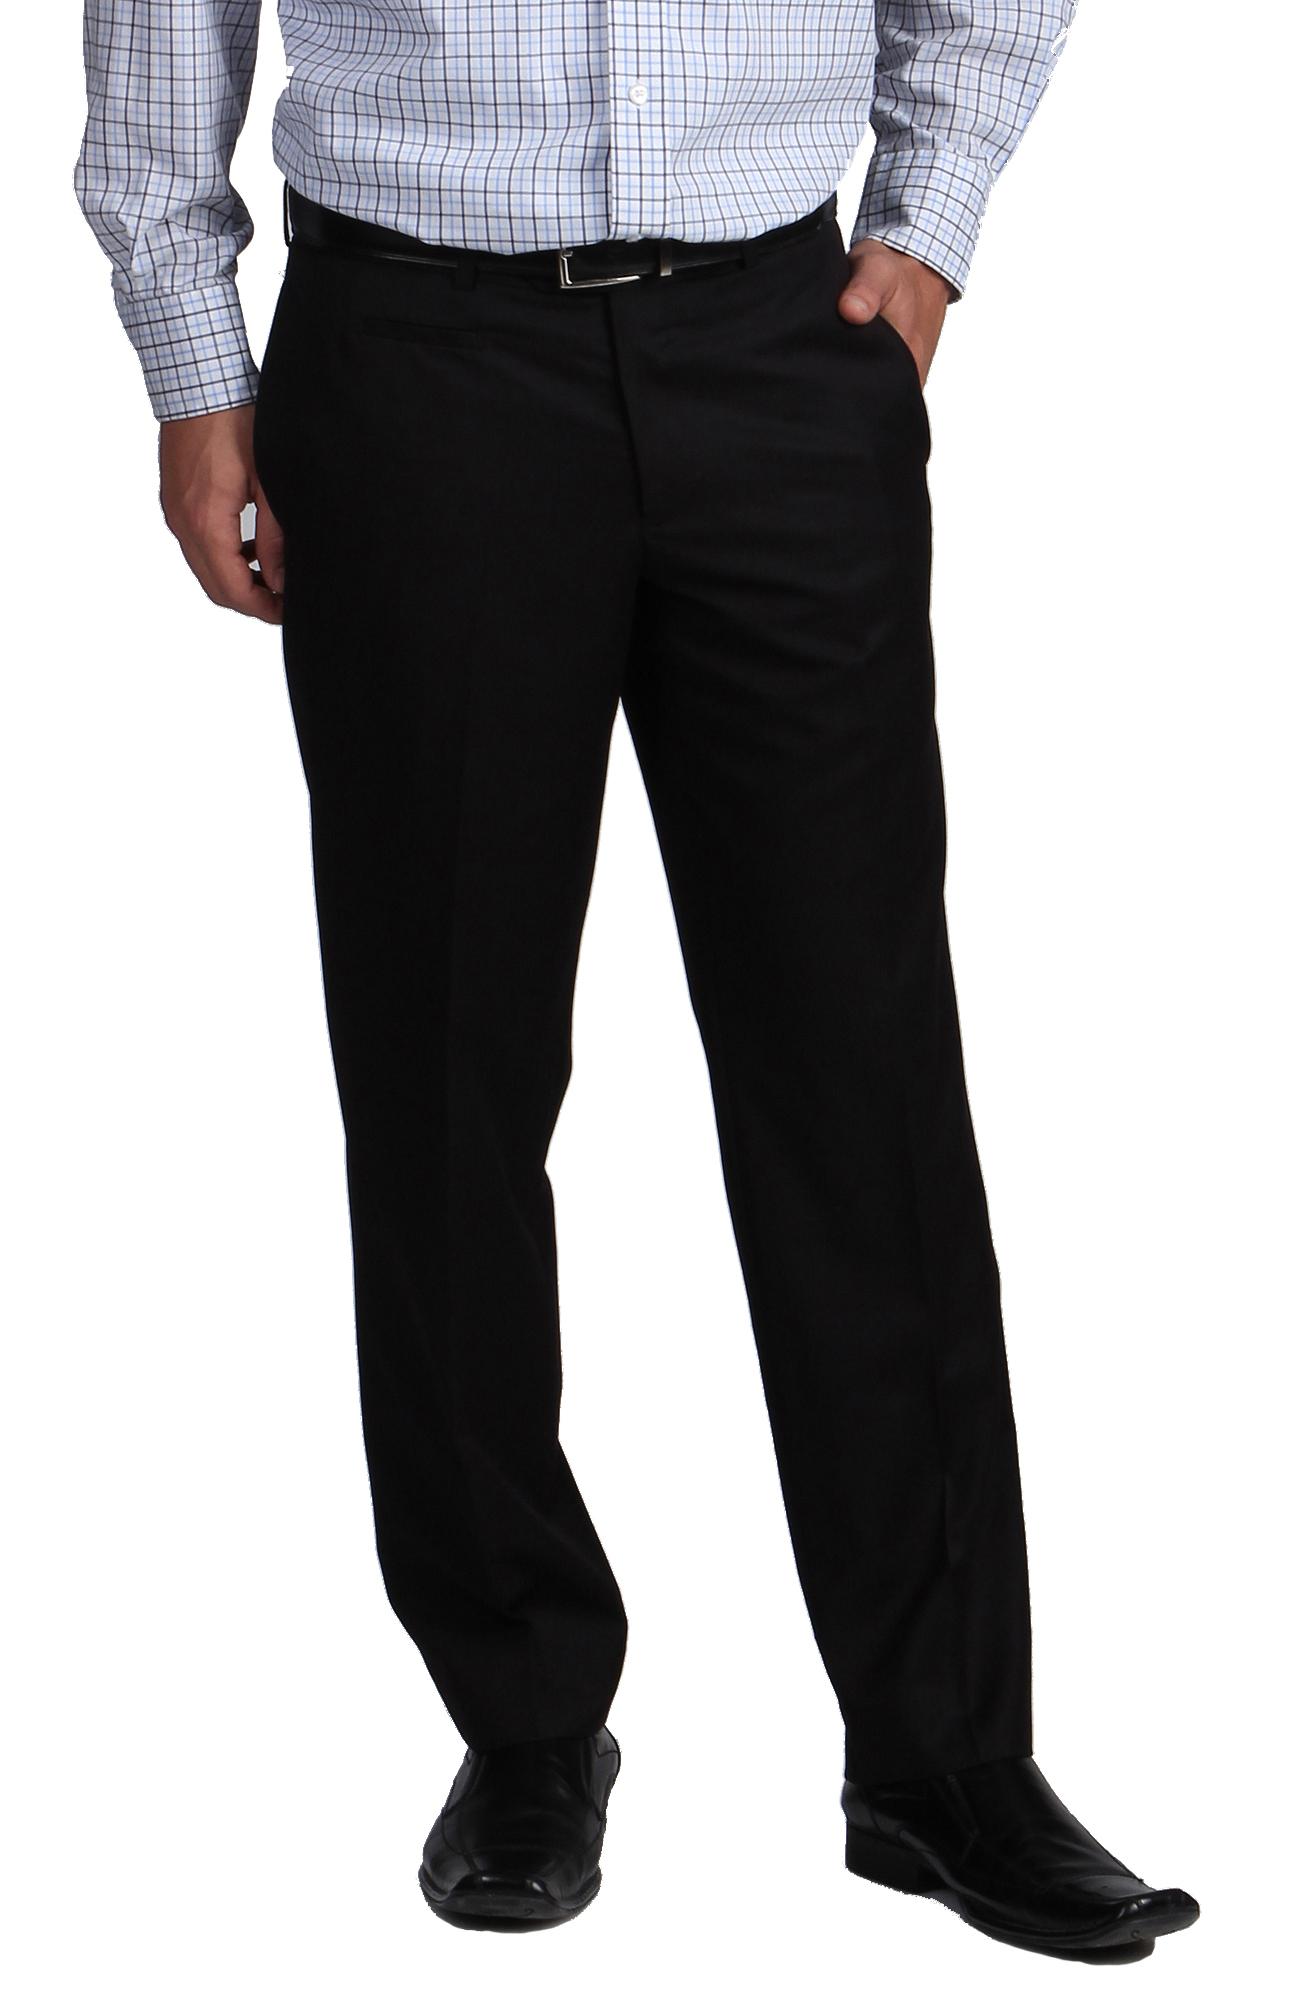 Black Formal Pants With Self Designs